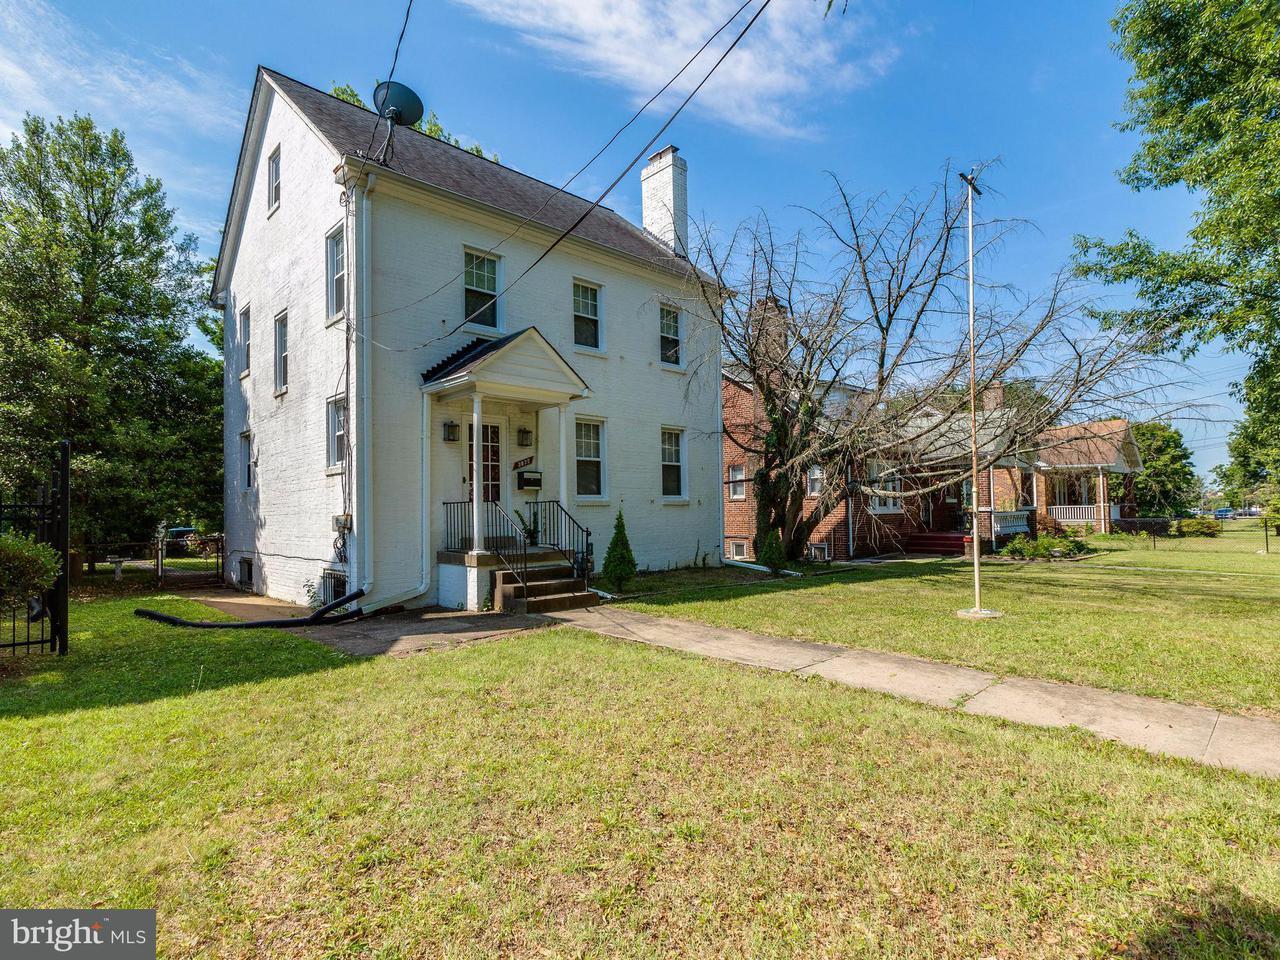 Single Family Home for Sale at 3035 ALABAMA AVE SE 3035 ALABAMA AVE SE Washington, District Of Columbia 20020 United States